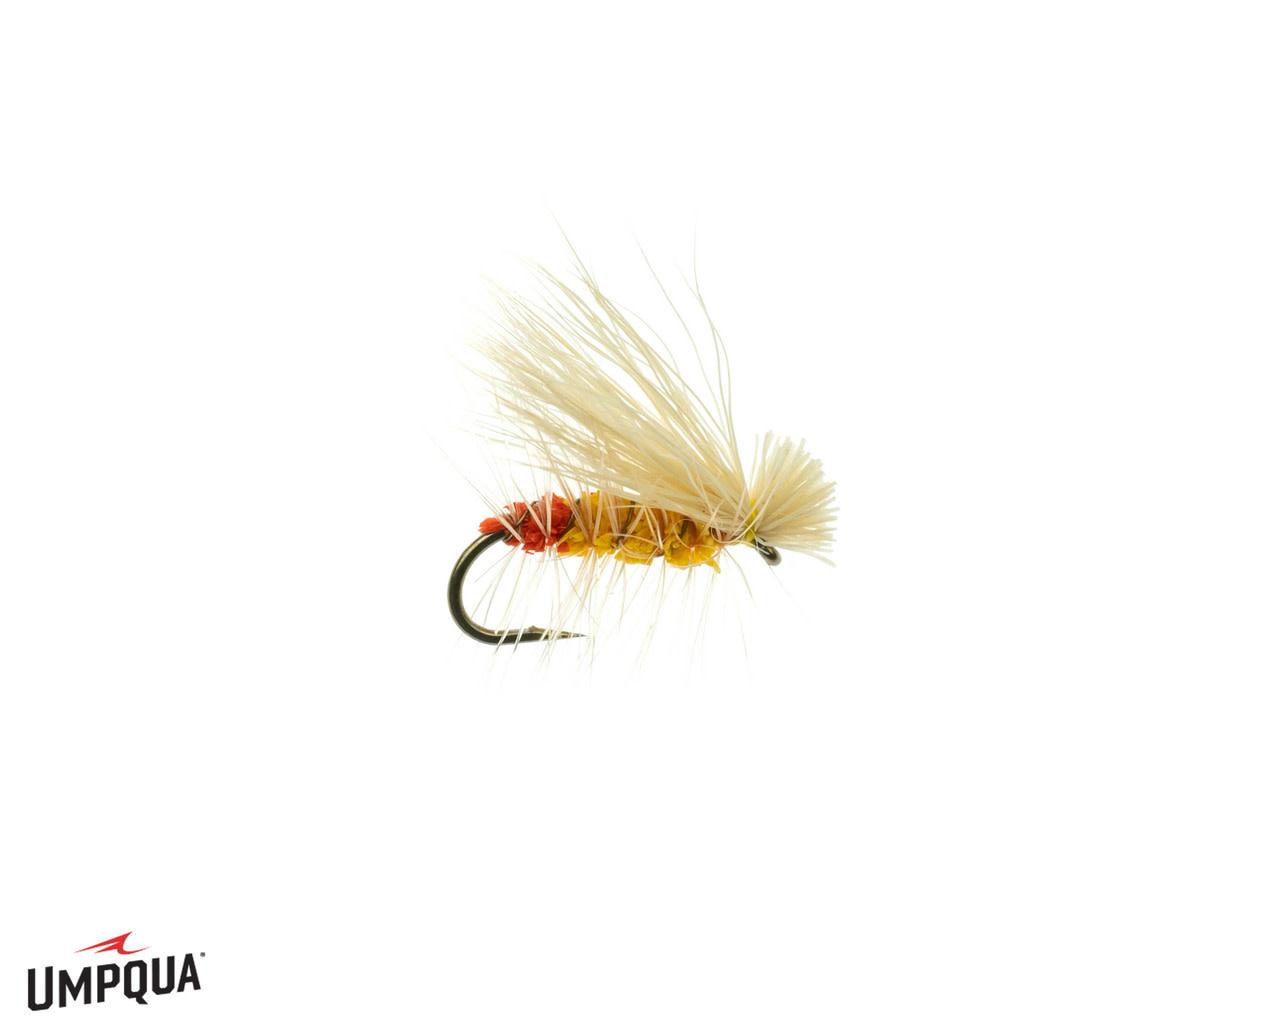 UMPQUA YELLOW SALLY STONE FLY  - SIZE 18